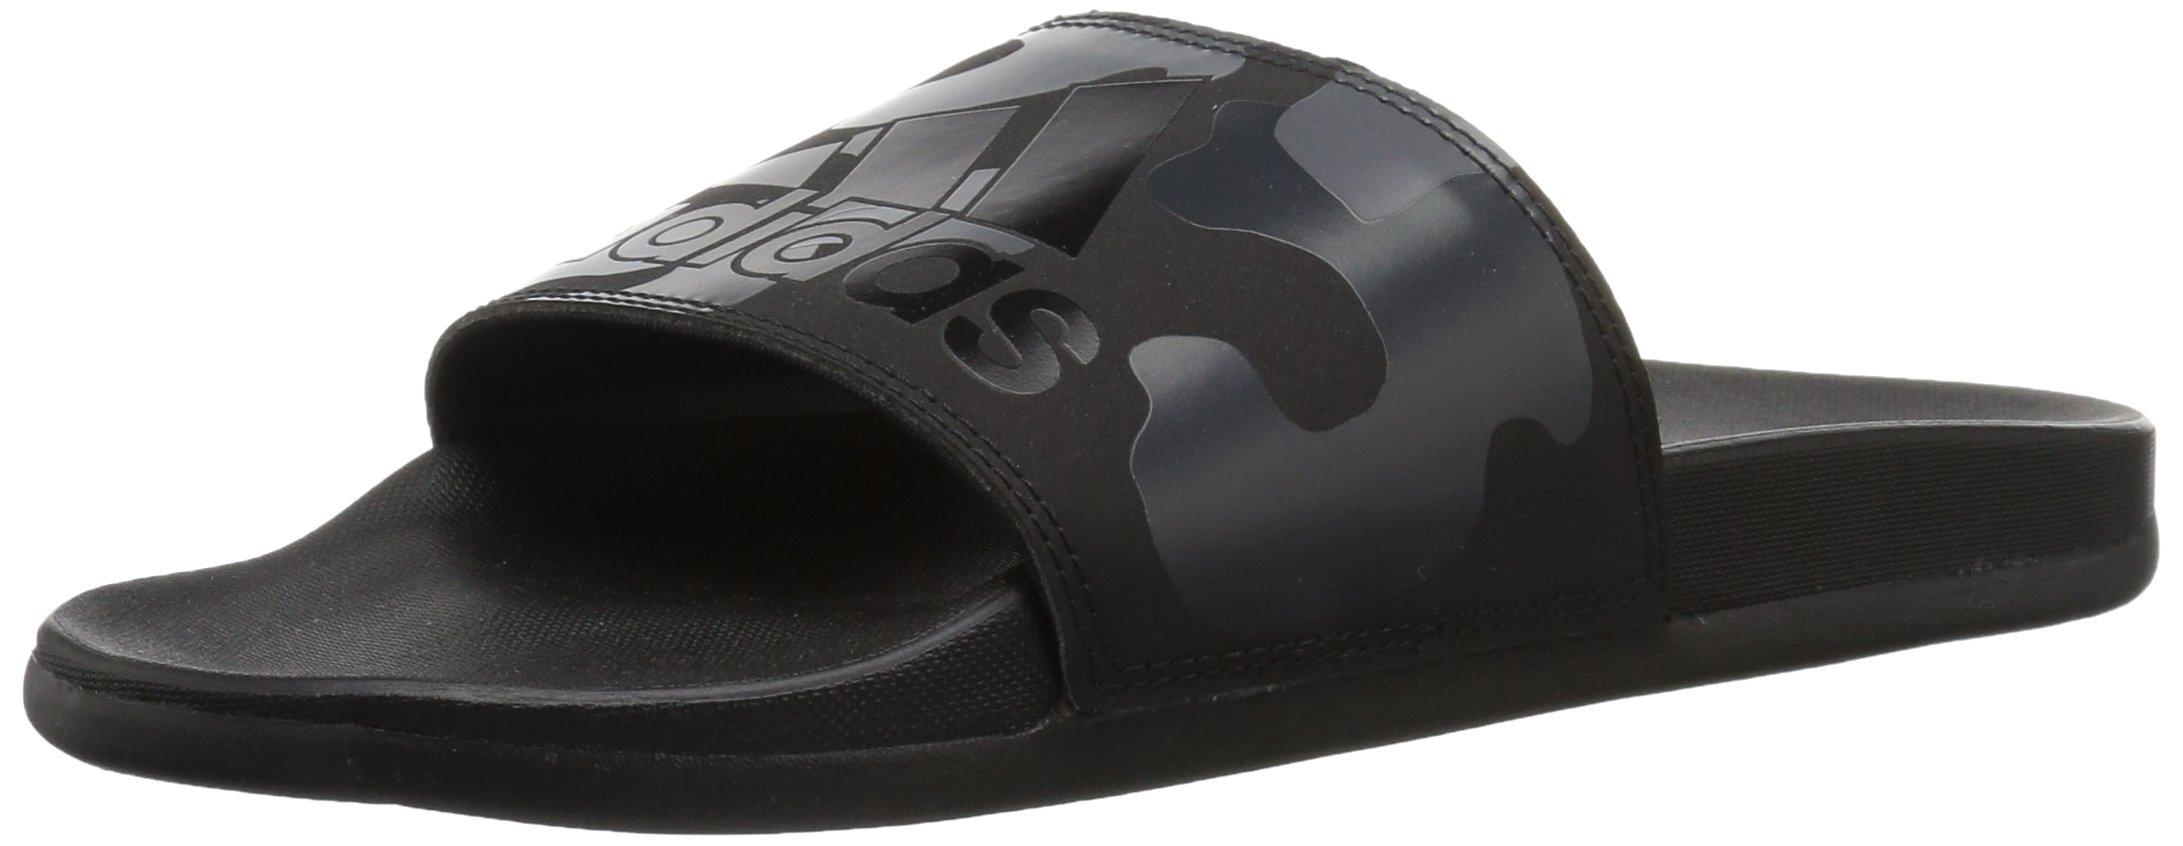 4ac46f5c0 Galleon - Adidas Performance Men s Adilette CF+ Link GR Slide Sandal ...